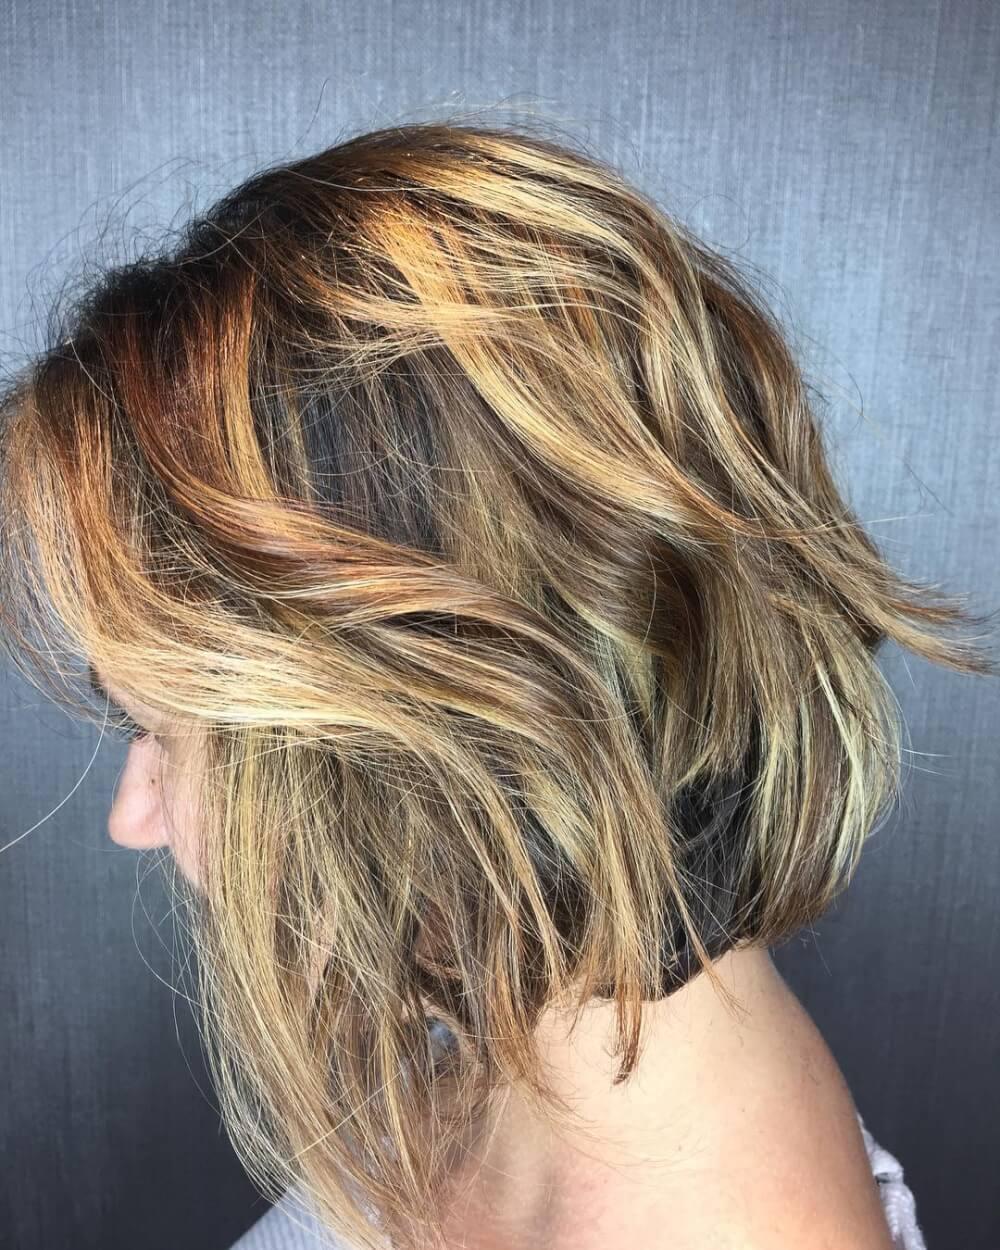 Razor Cut Bob hairstyle